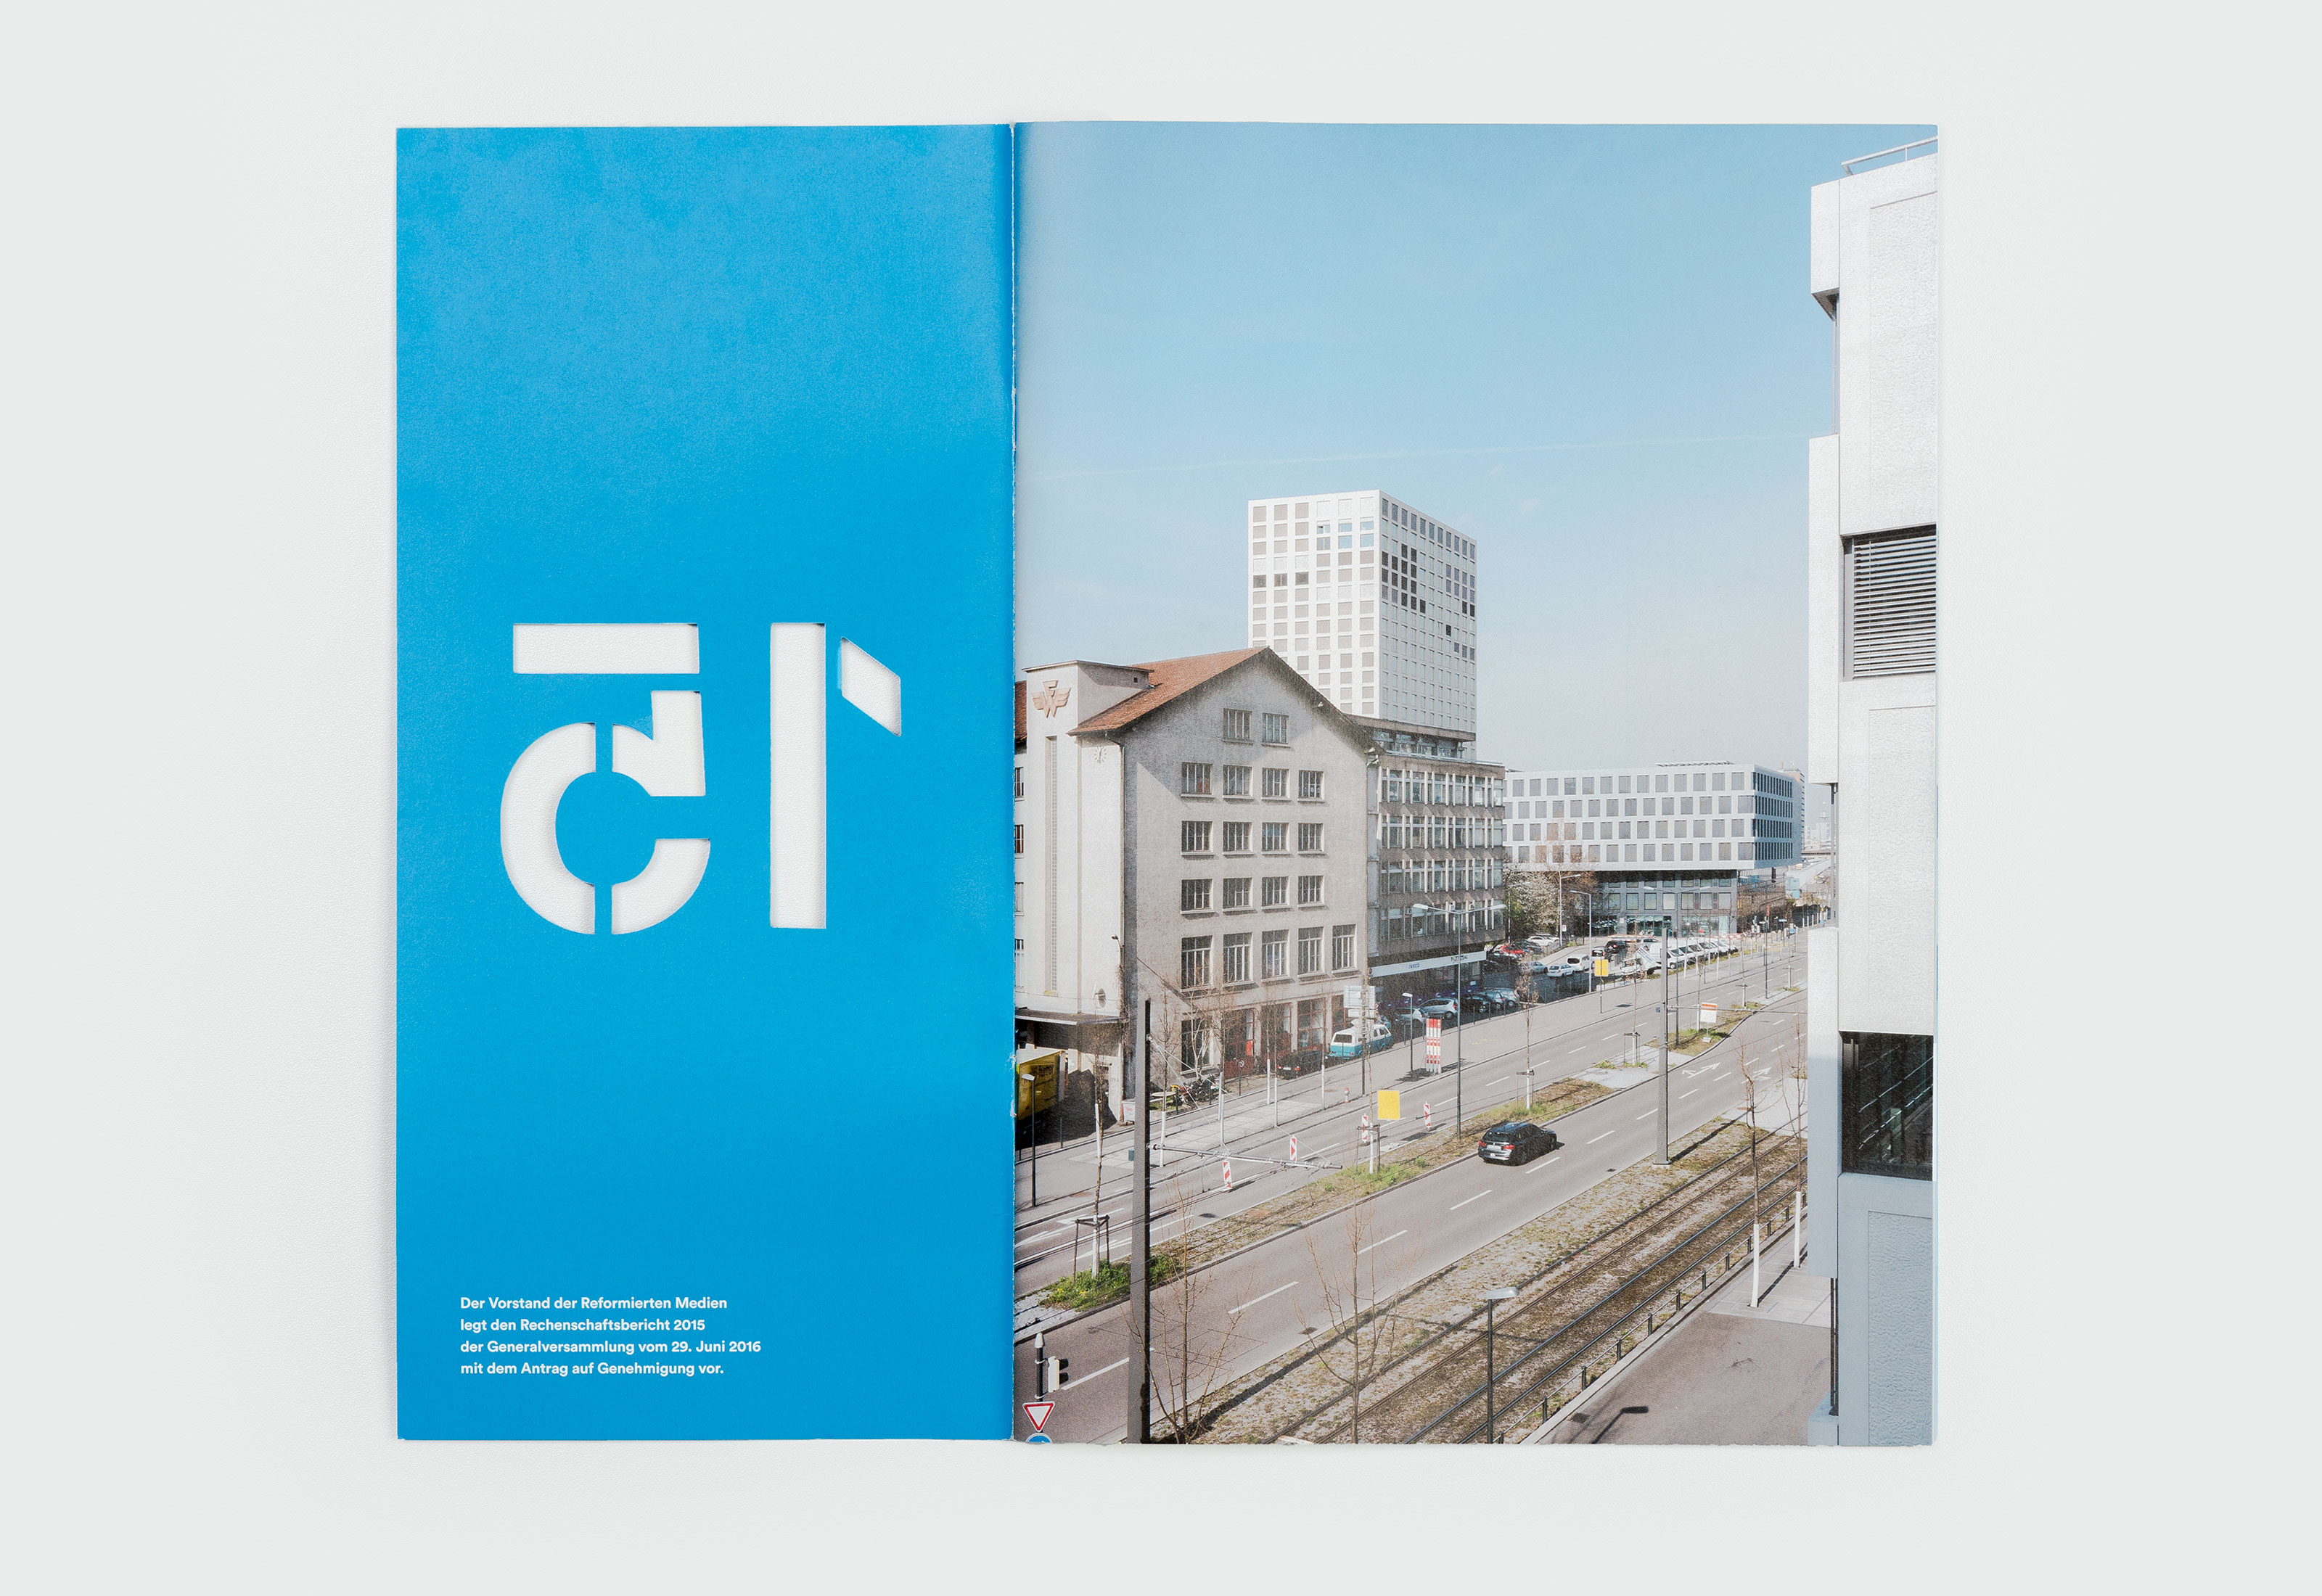 Reformierte Medien – Jahresbericht 2015, cover open ©Atelier Pol × Barbara Hess